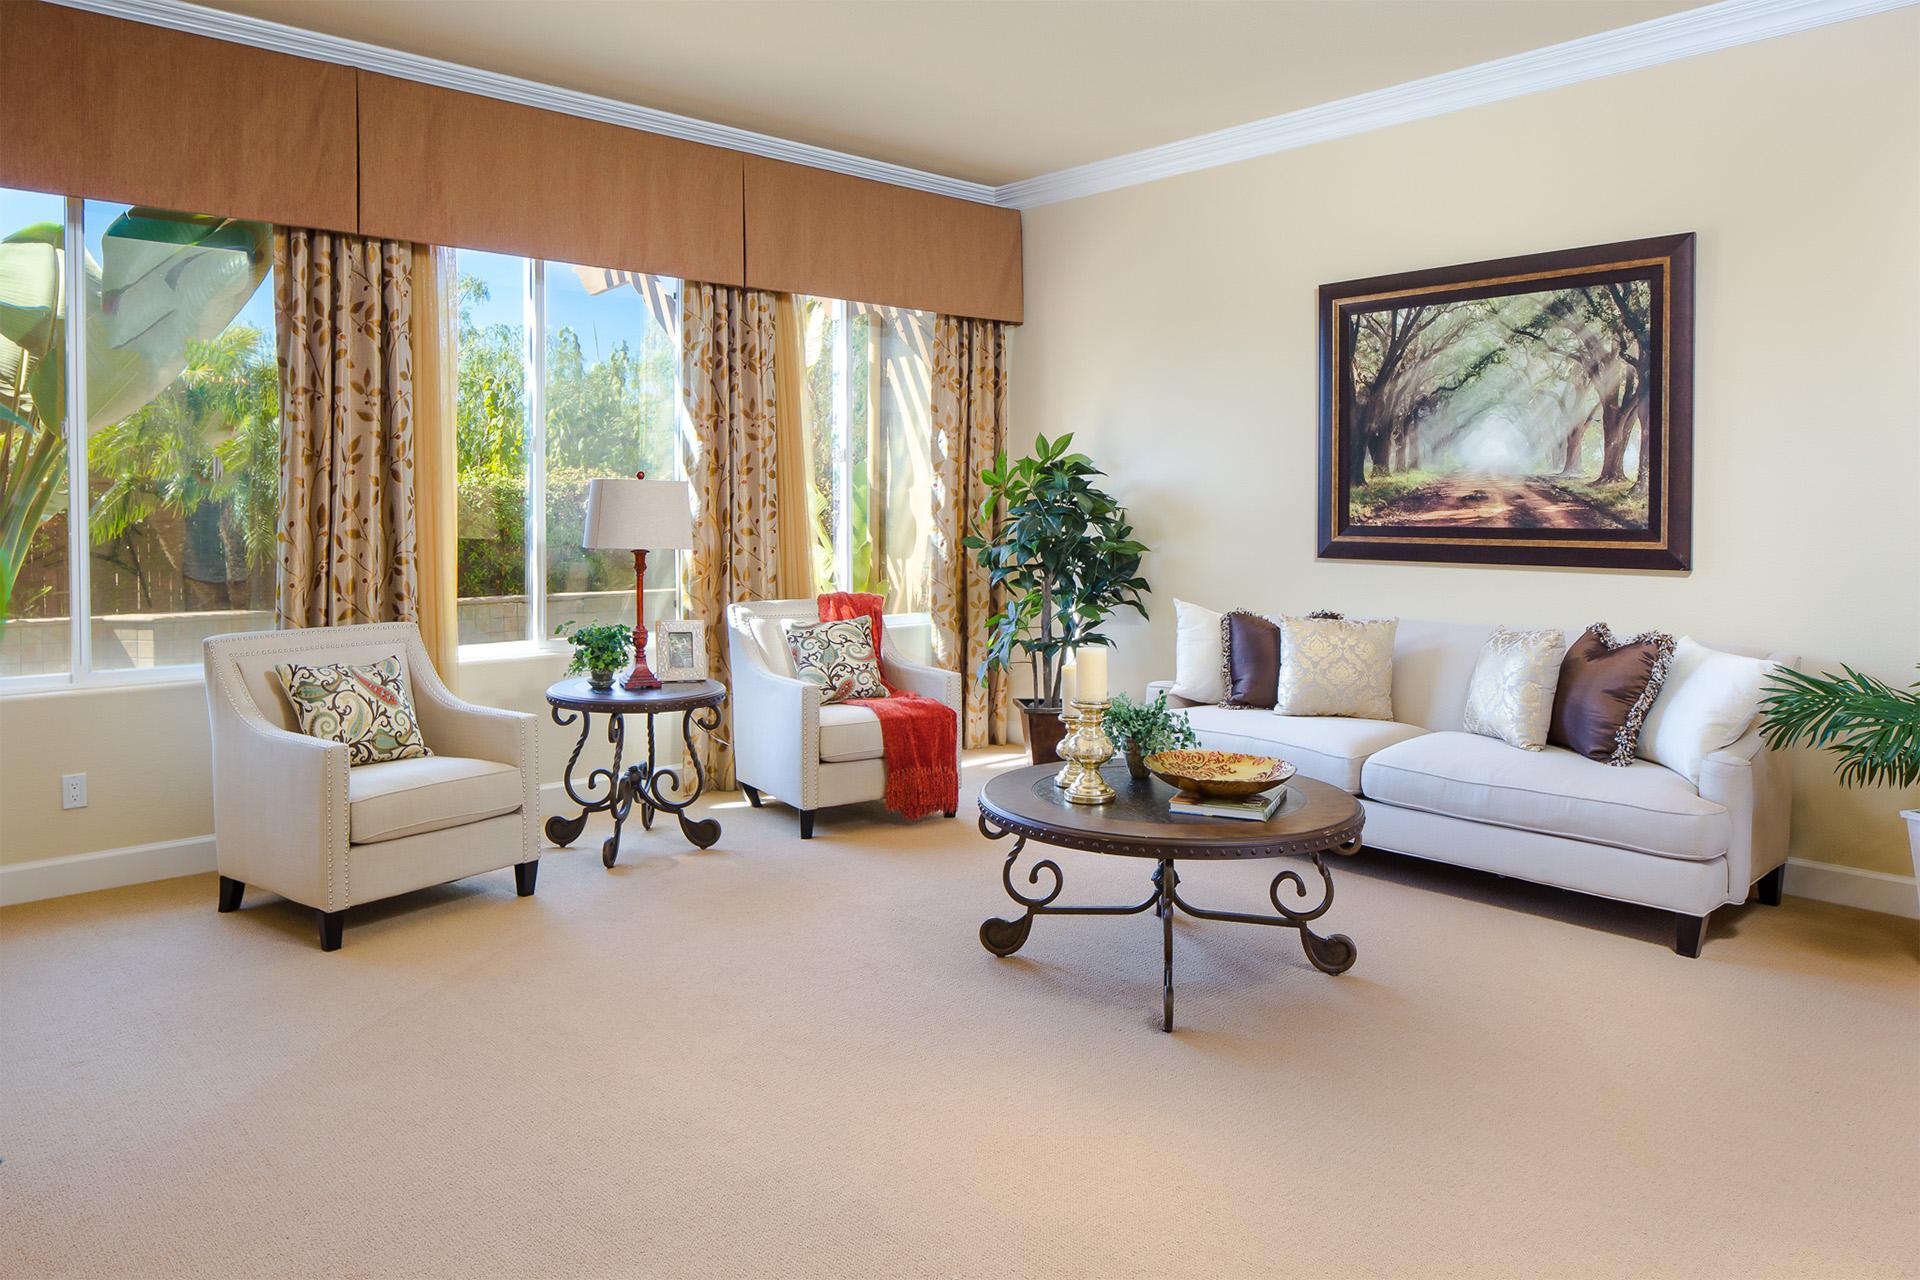 home staging services san diego maha 39 s home staging. Black Bedroom Furniture Sets. Home Design Ideas